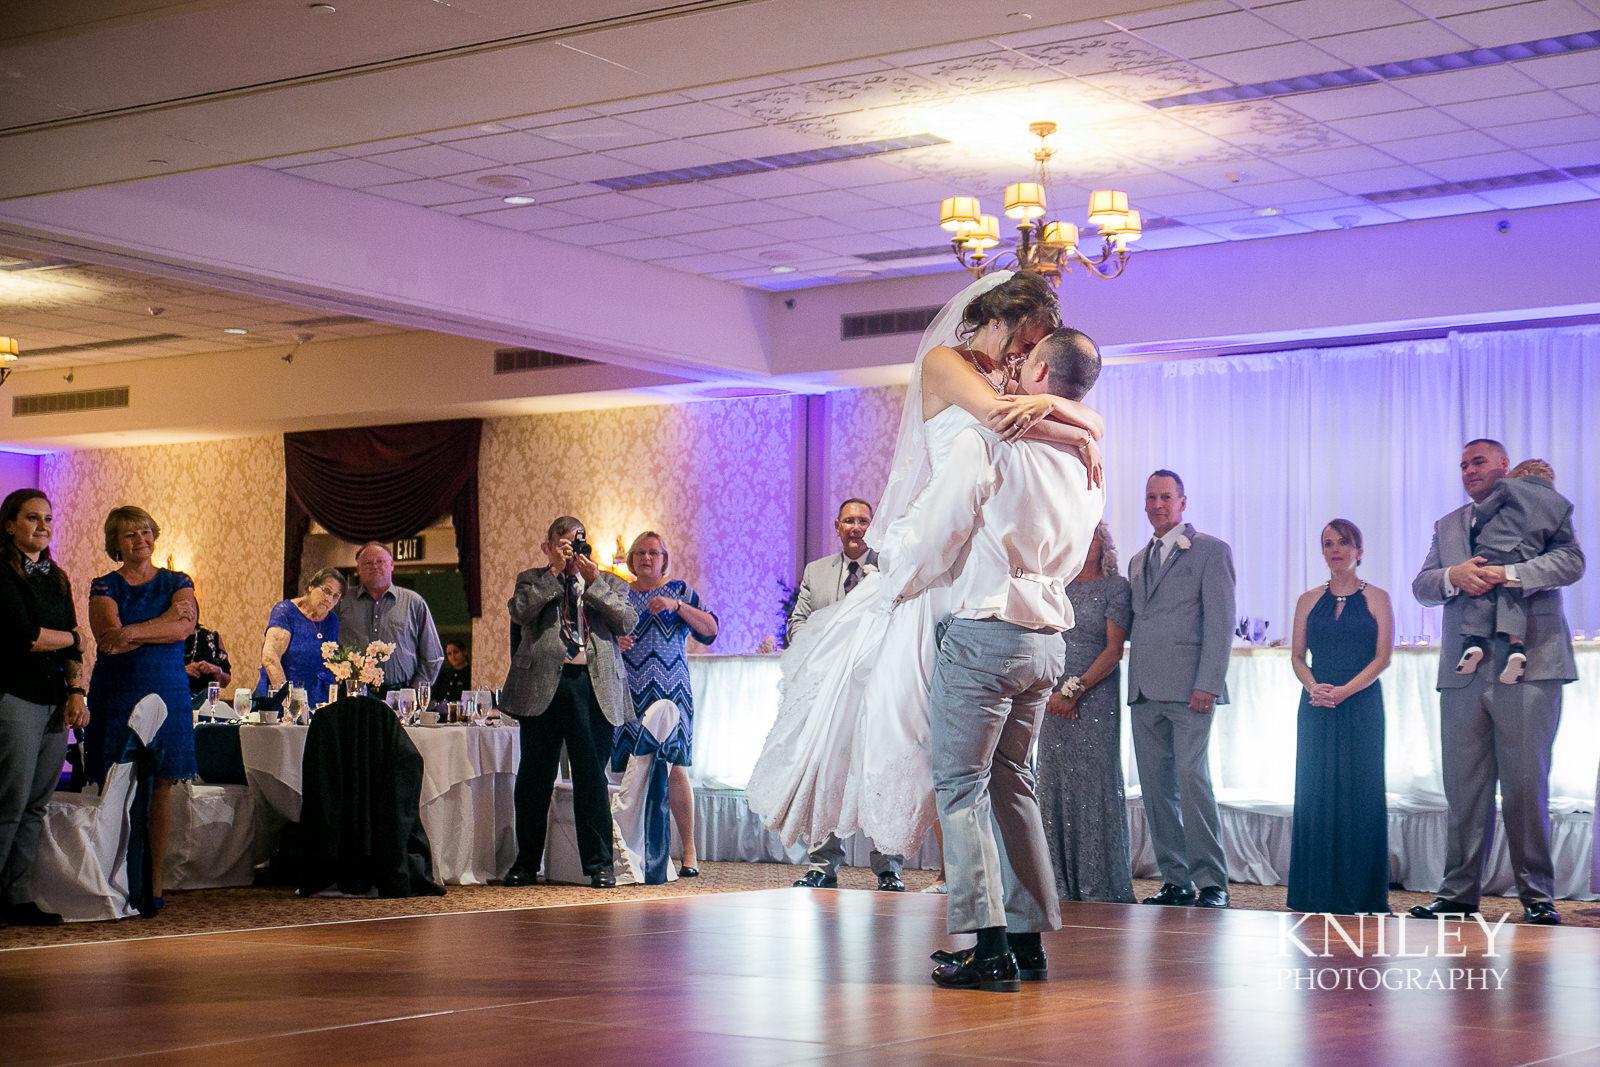 100 - Rochester Riverside Convention Center Wedding Photo - Rocheser NY - IMG_3723.jpg